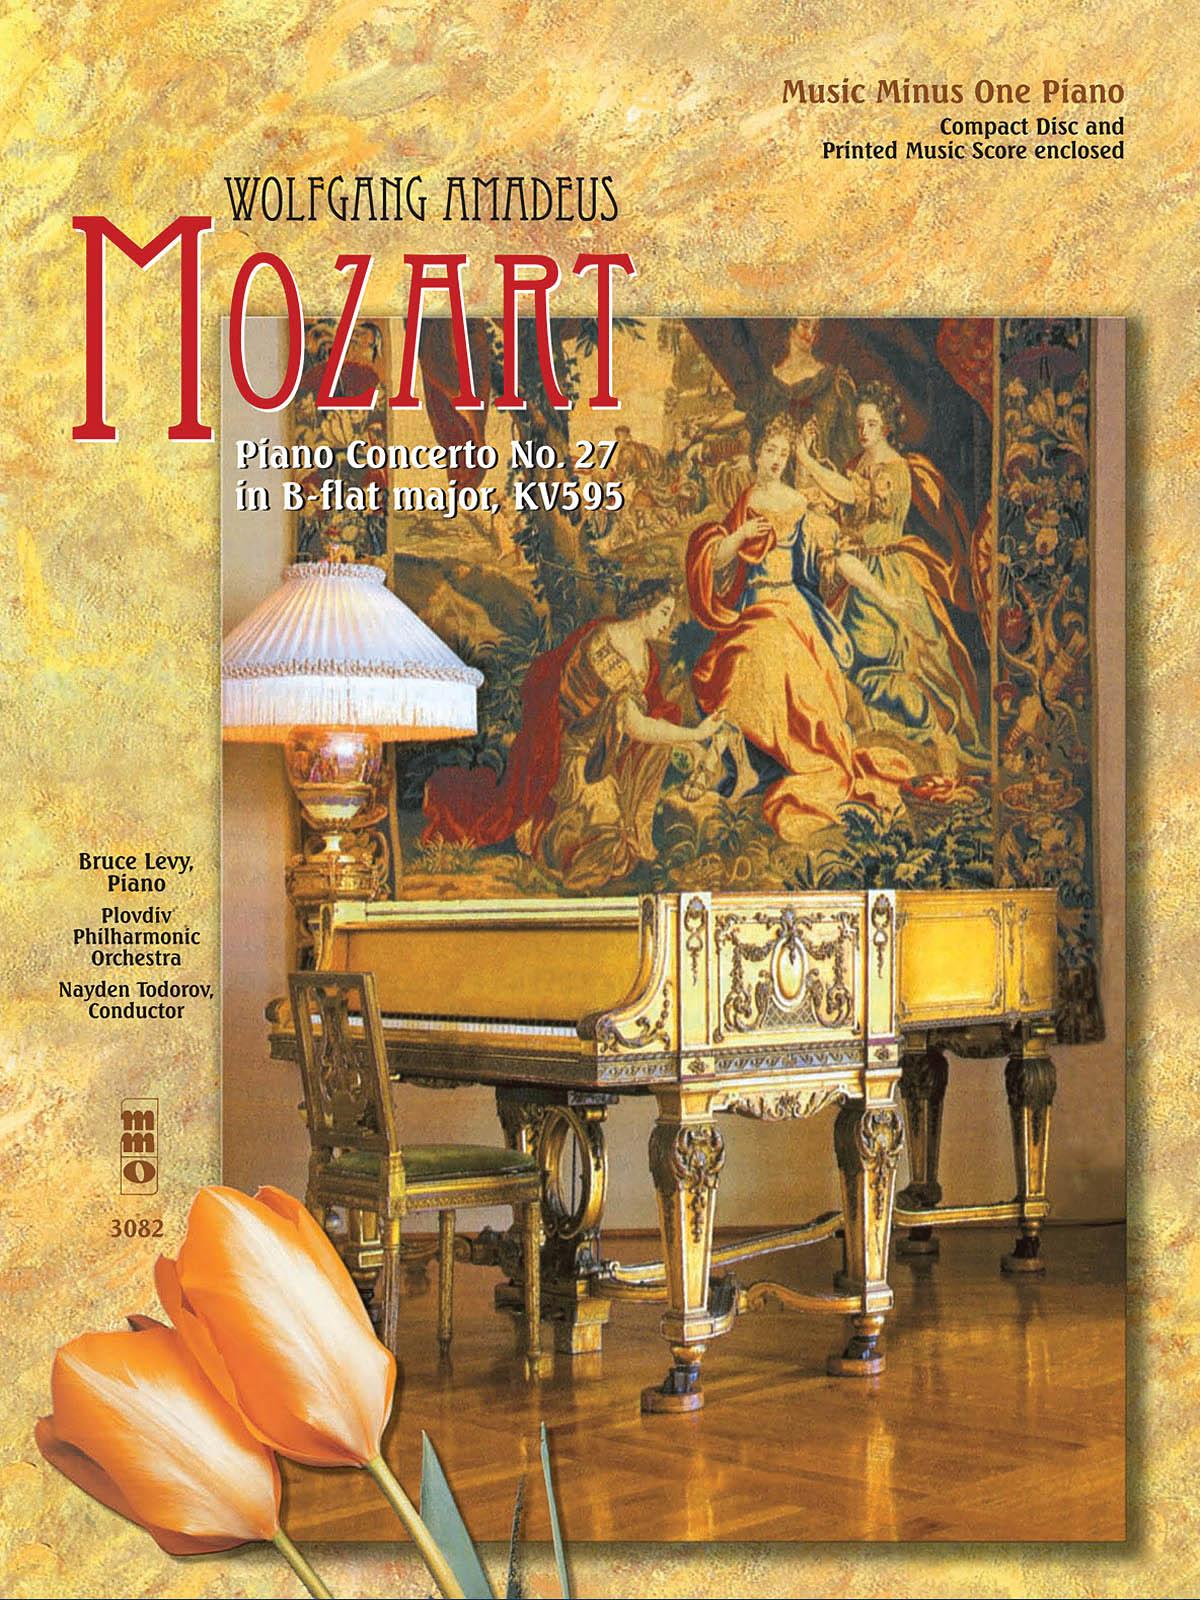 Wolfgang Amadeus Mozart: Piano Concerto No. 27 in B-flat Major  KV595: Piano